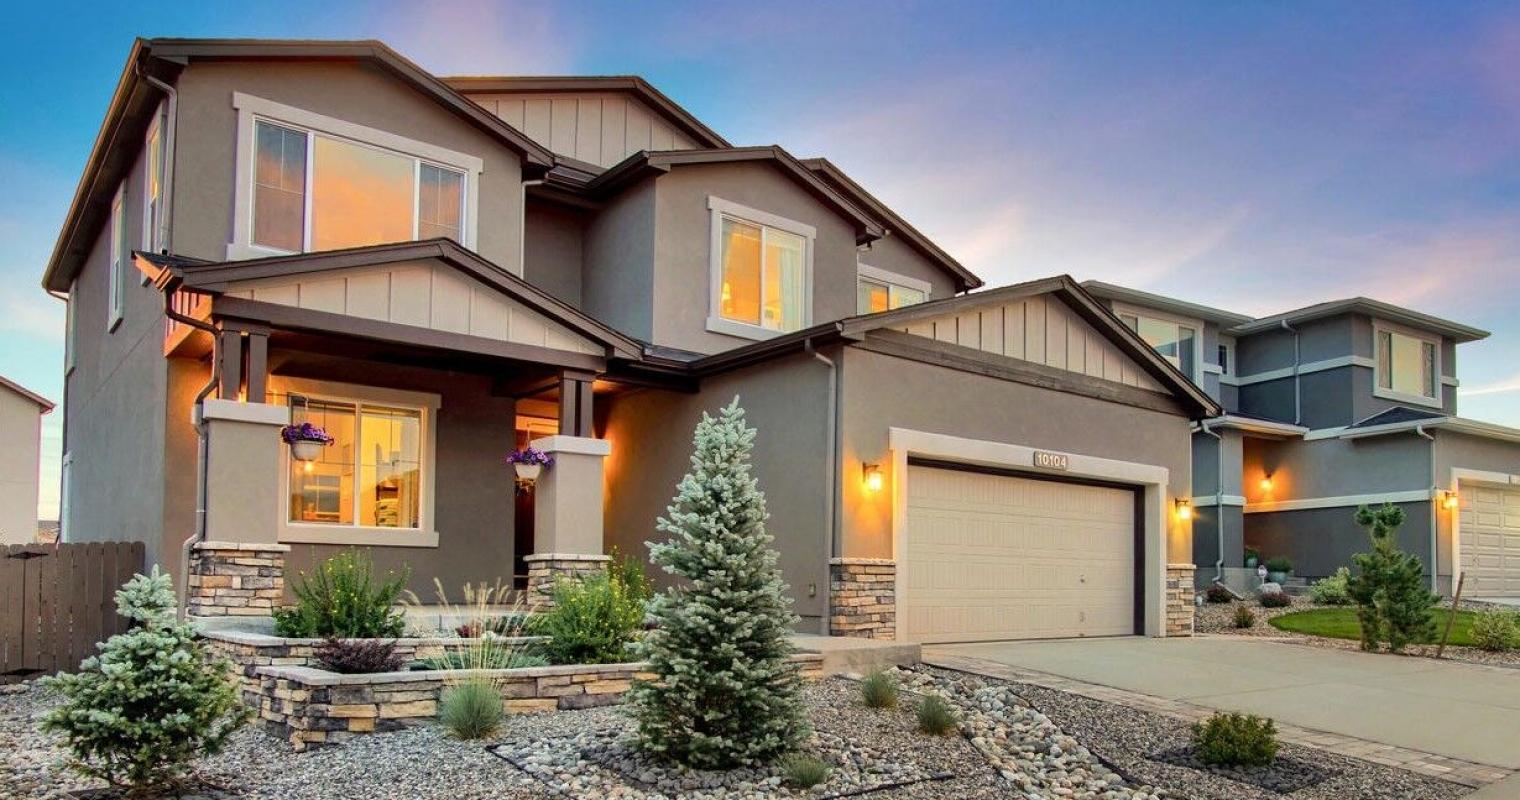 Stunning 2-Story Stucco Cordera Home